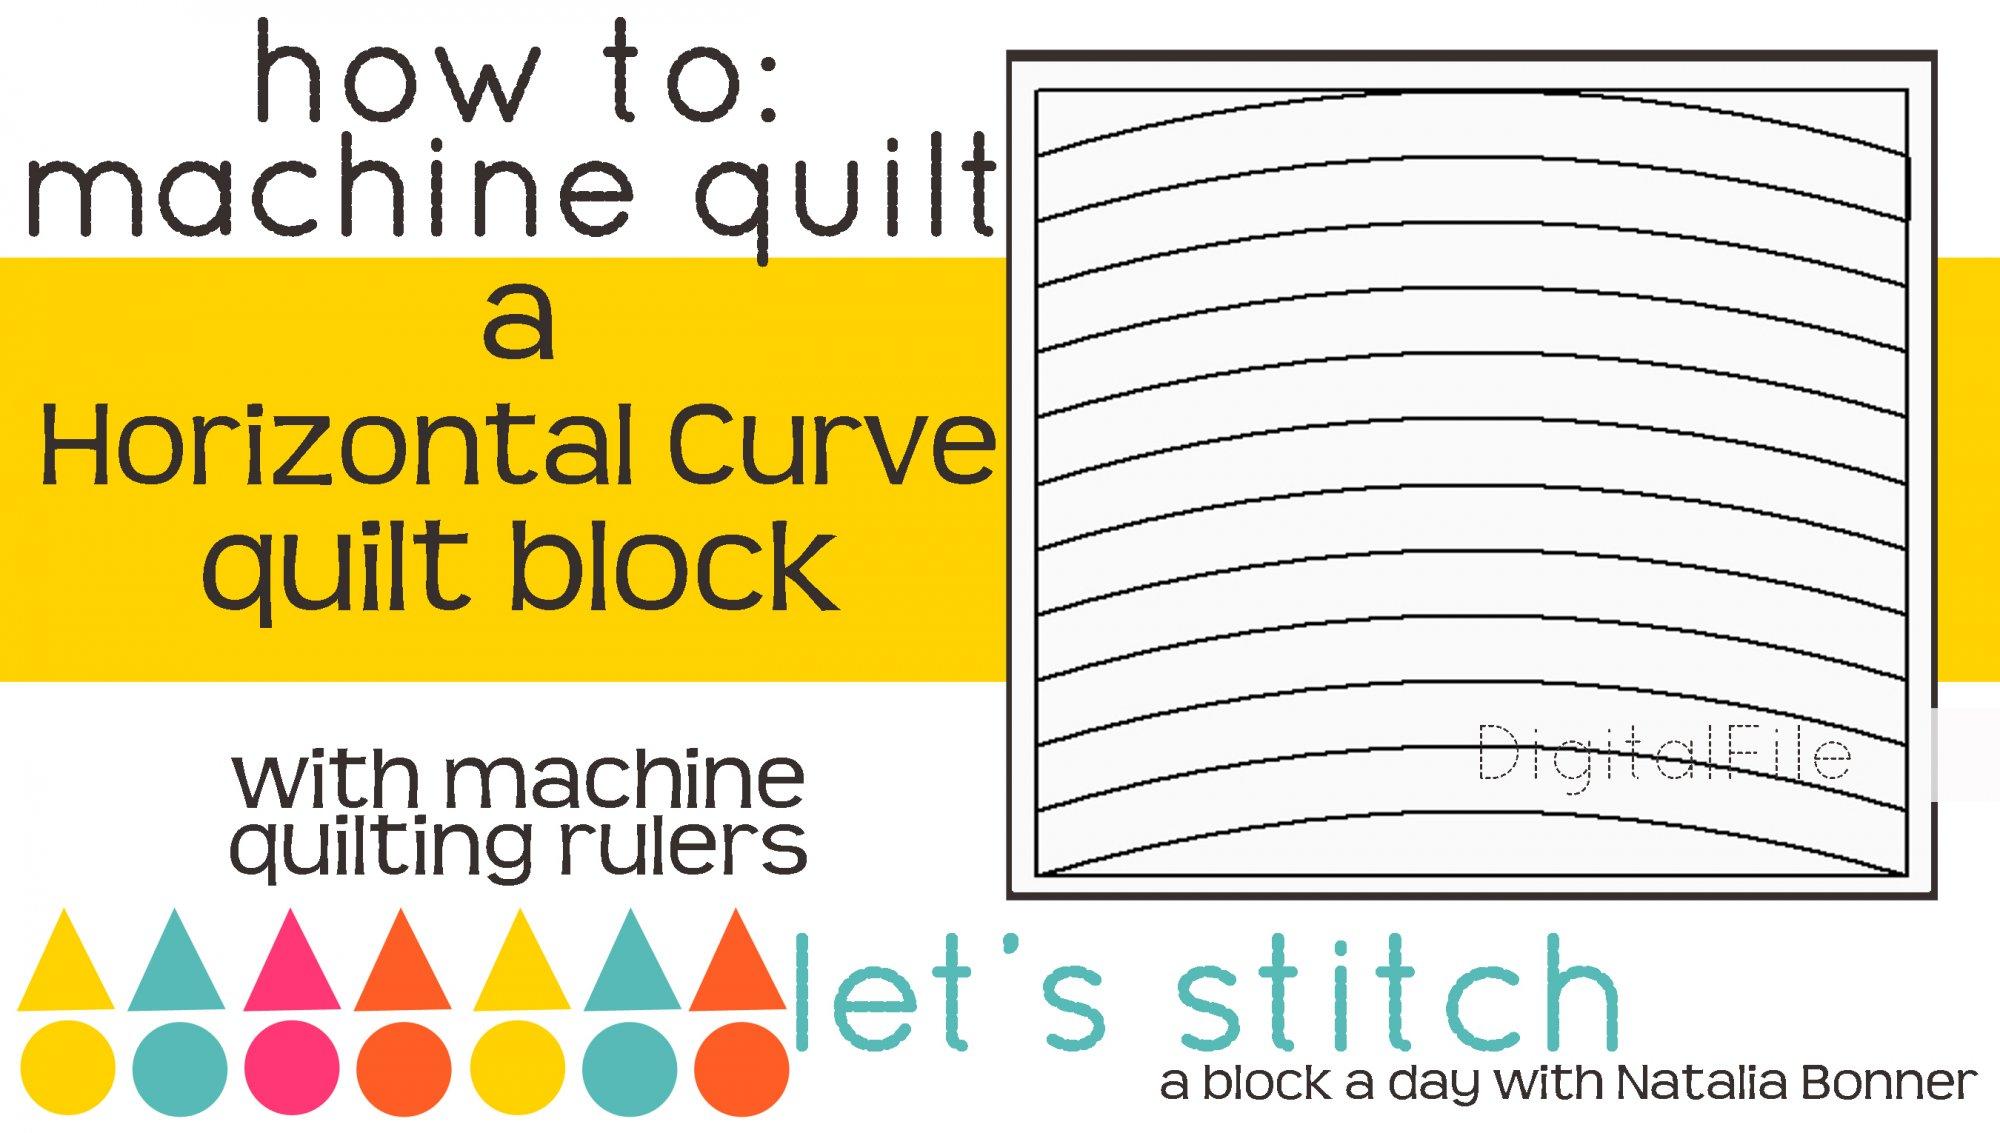 Horizontal Curve 6 Block - Digital